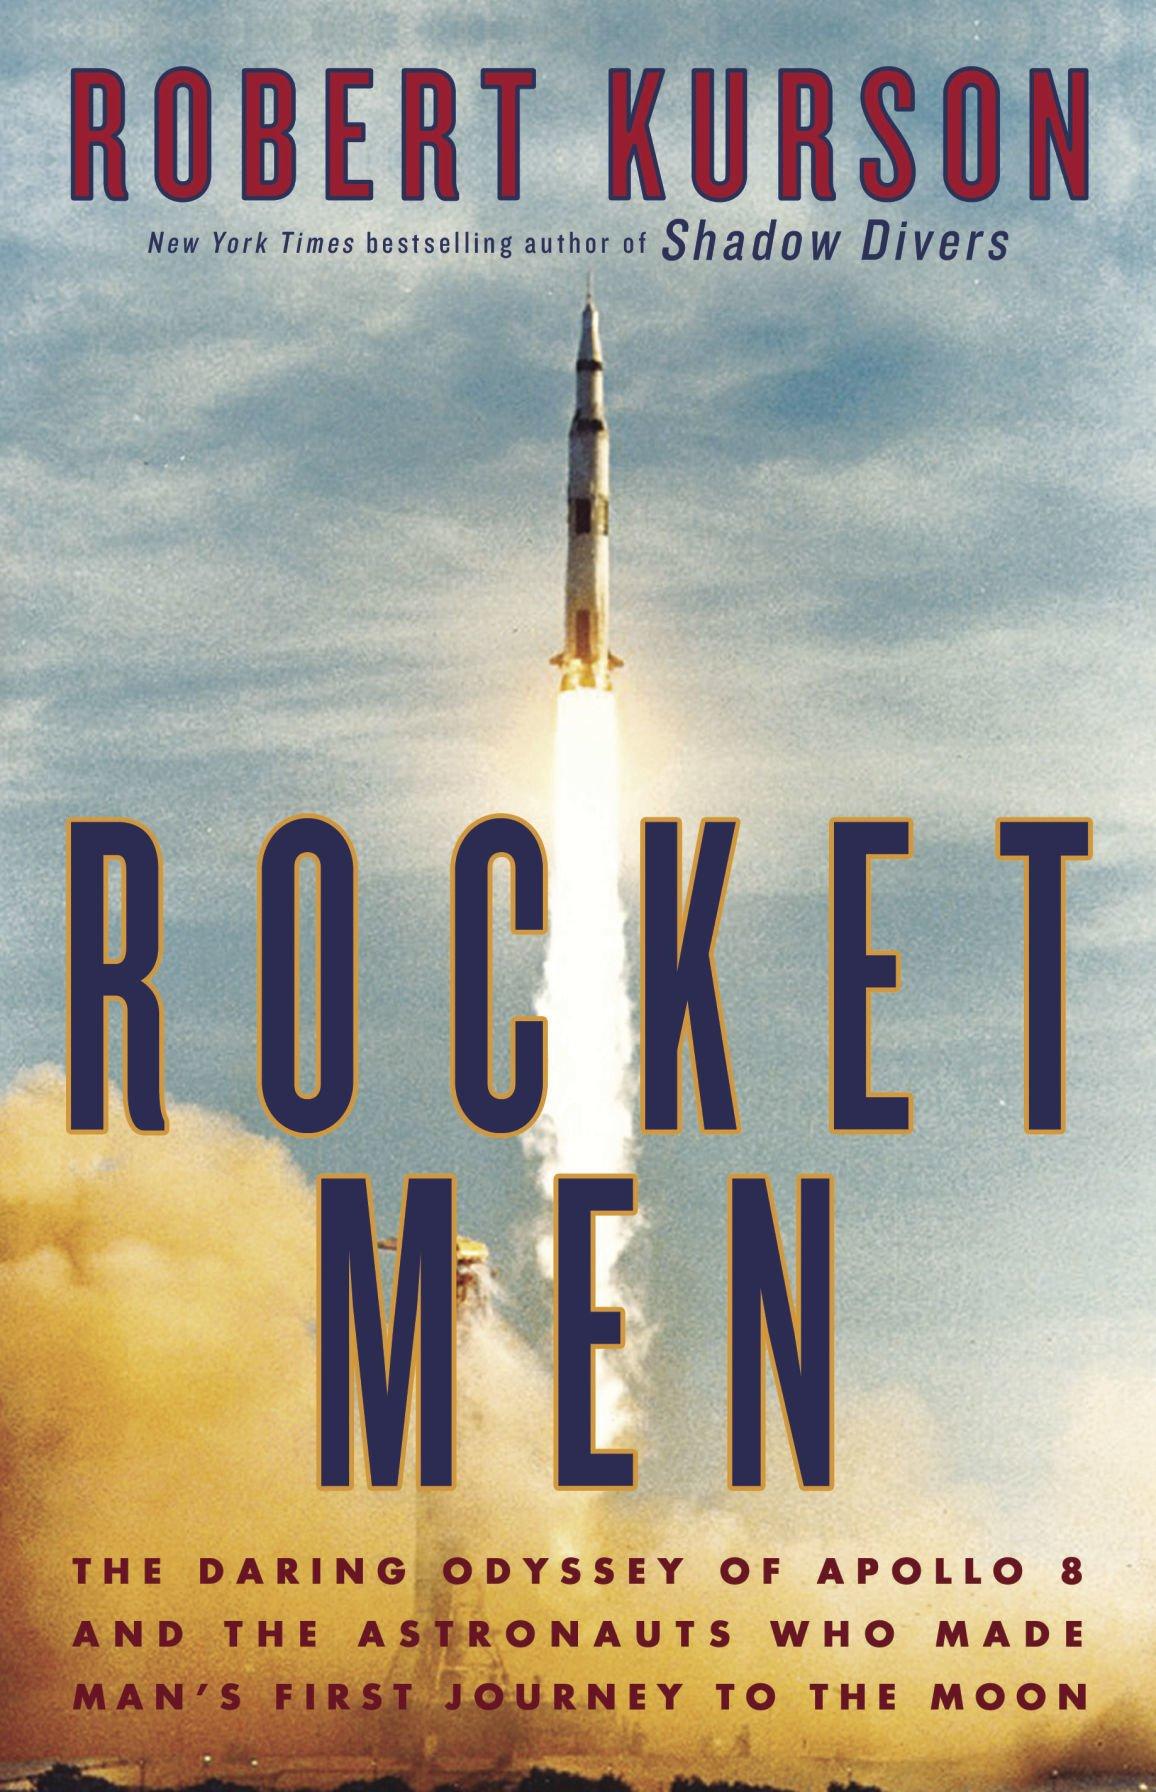 'Rocket Men'